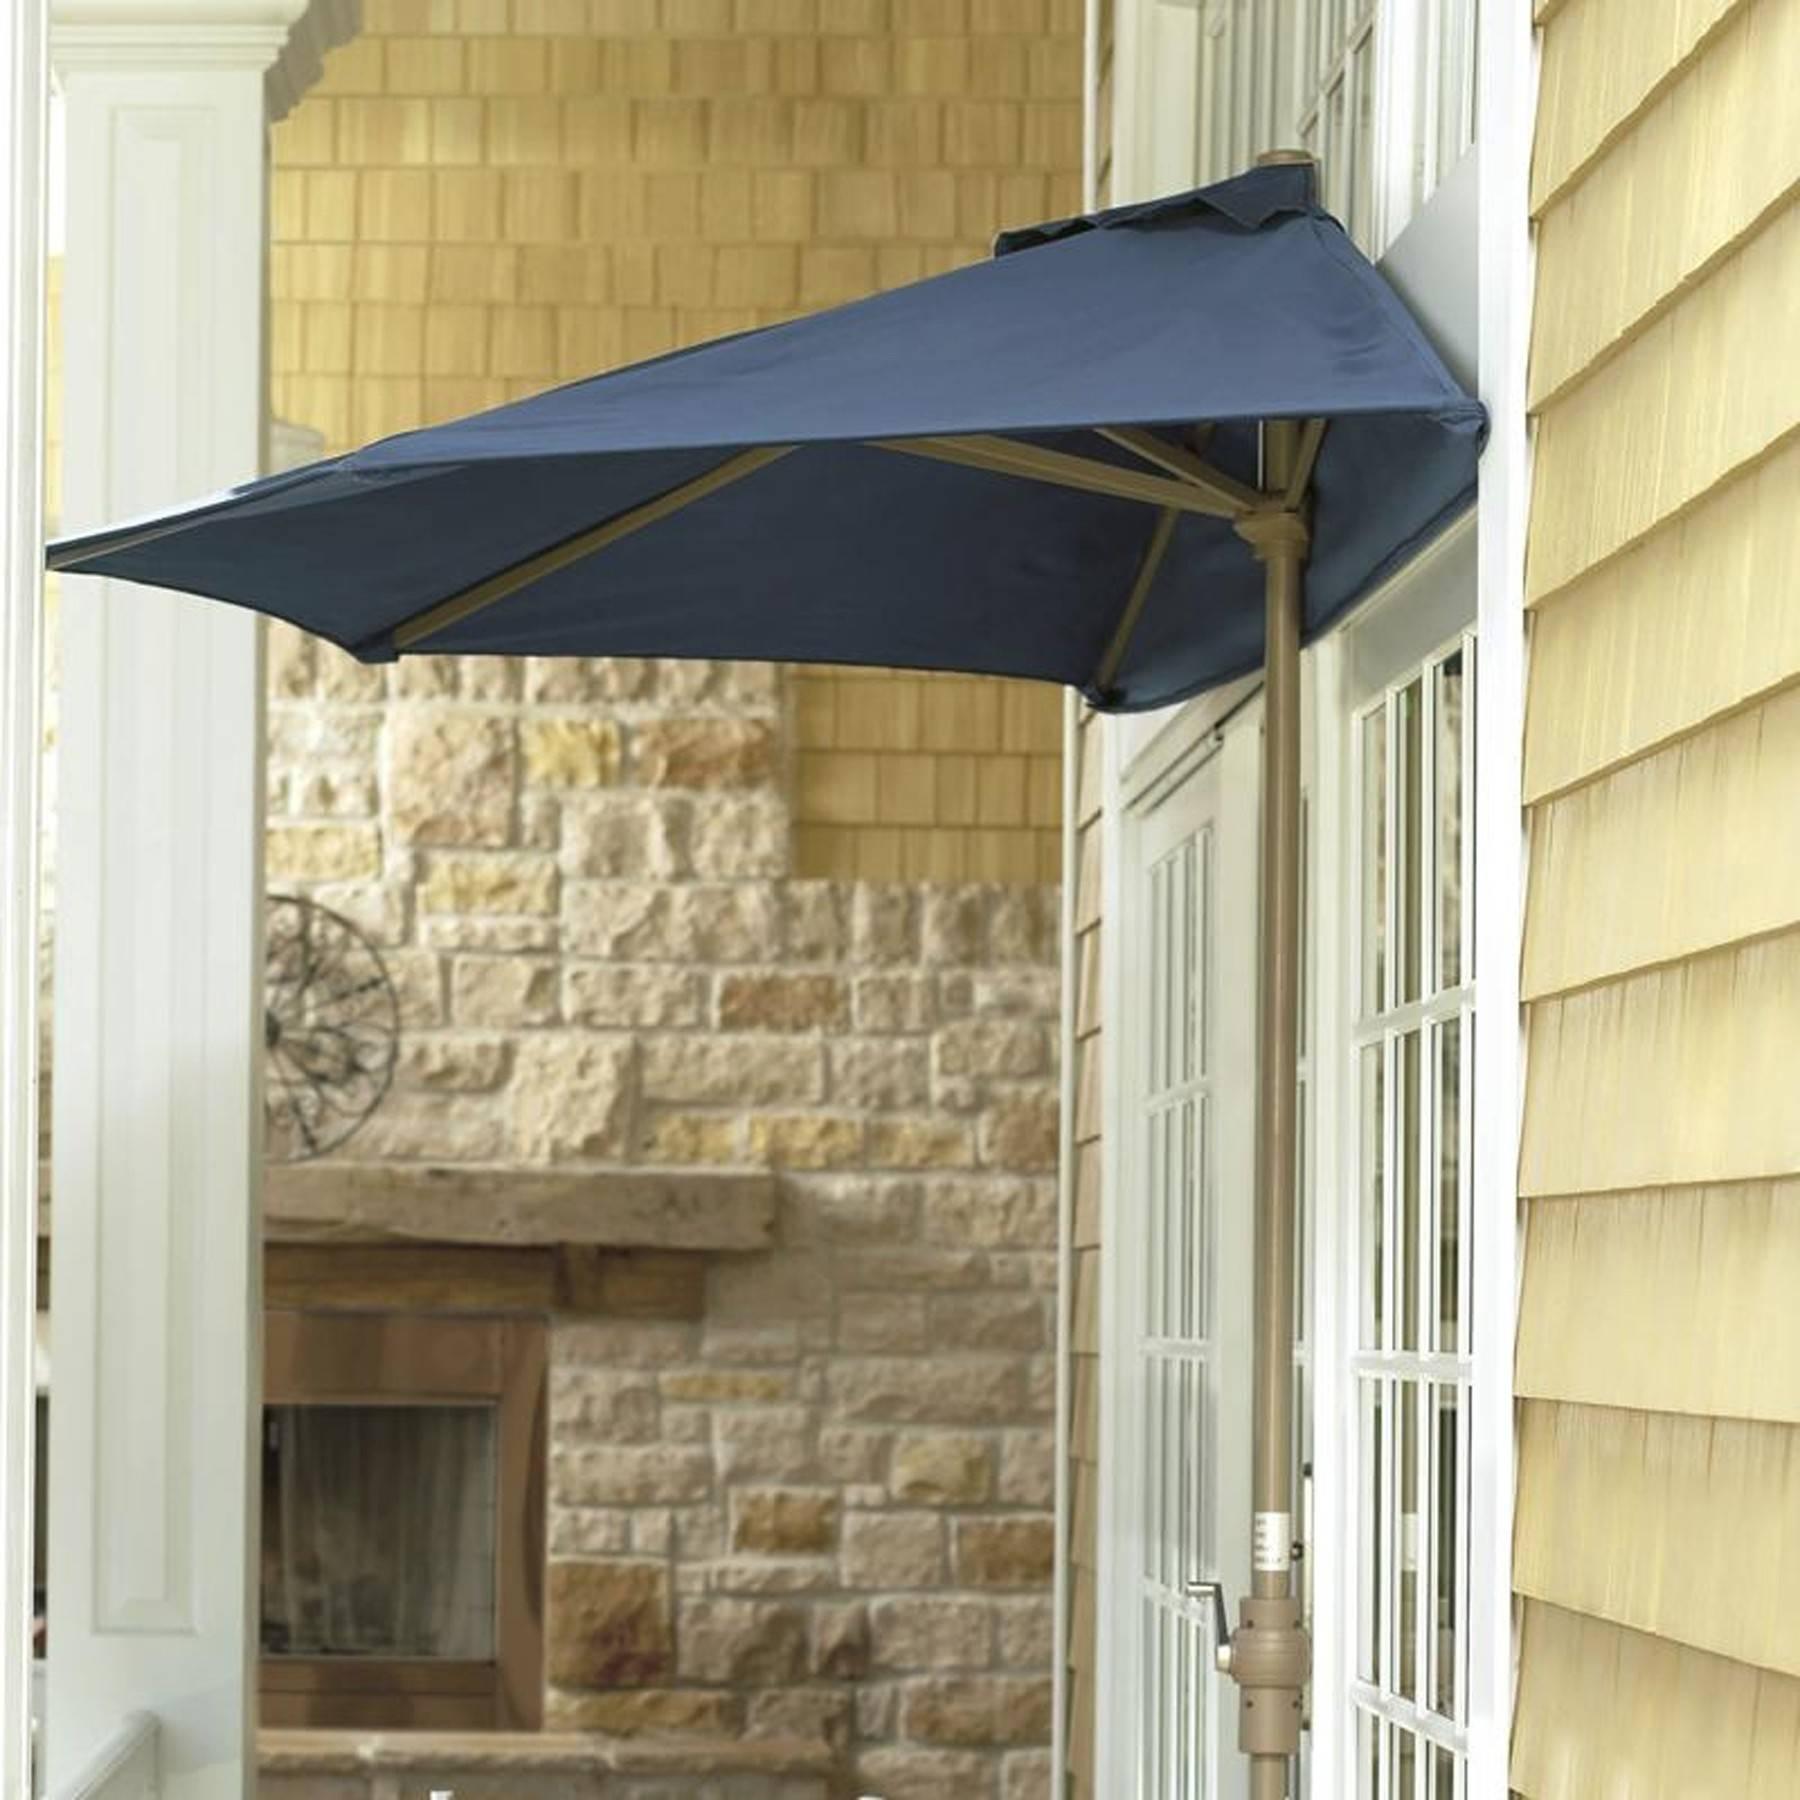 Great In Super Tight Spaces, Utilize The Half Umbrella Style